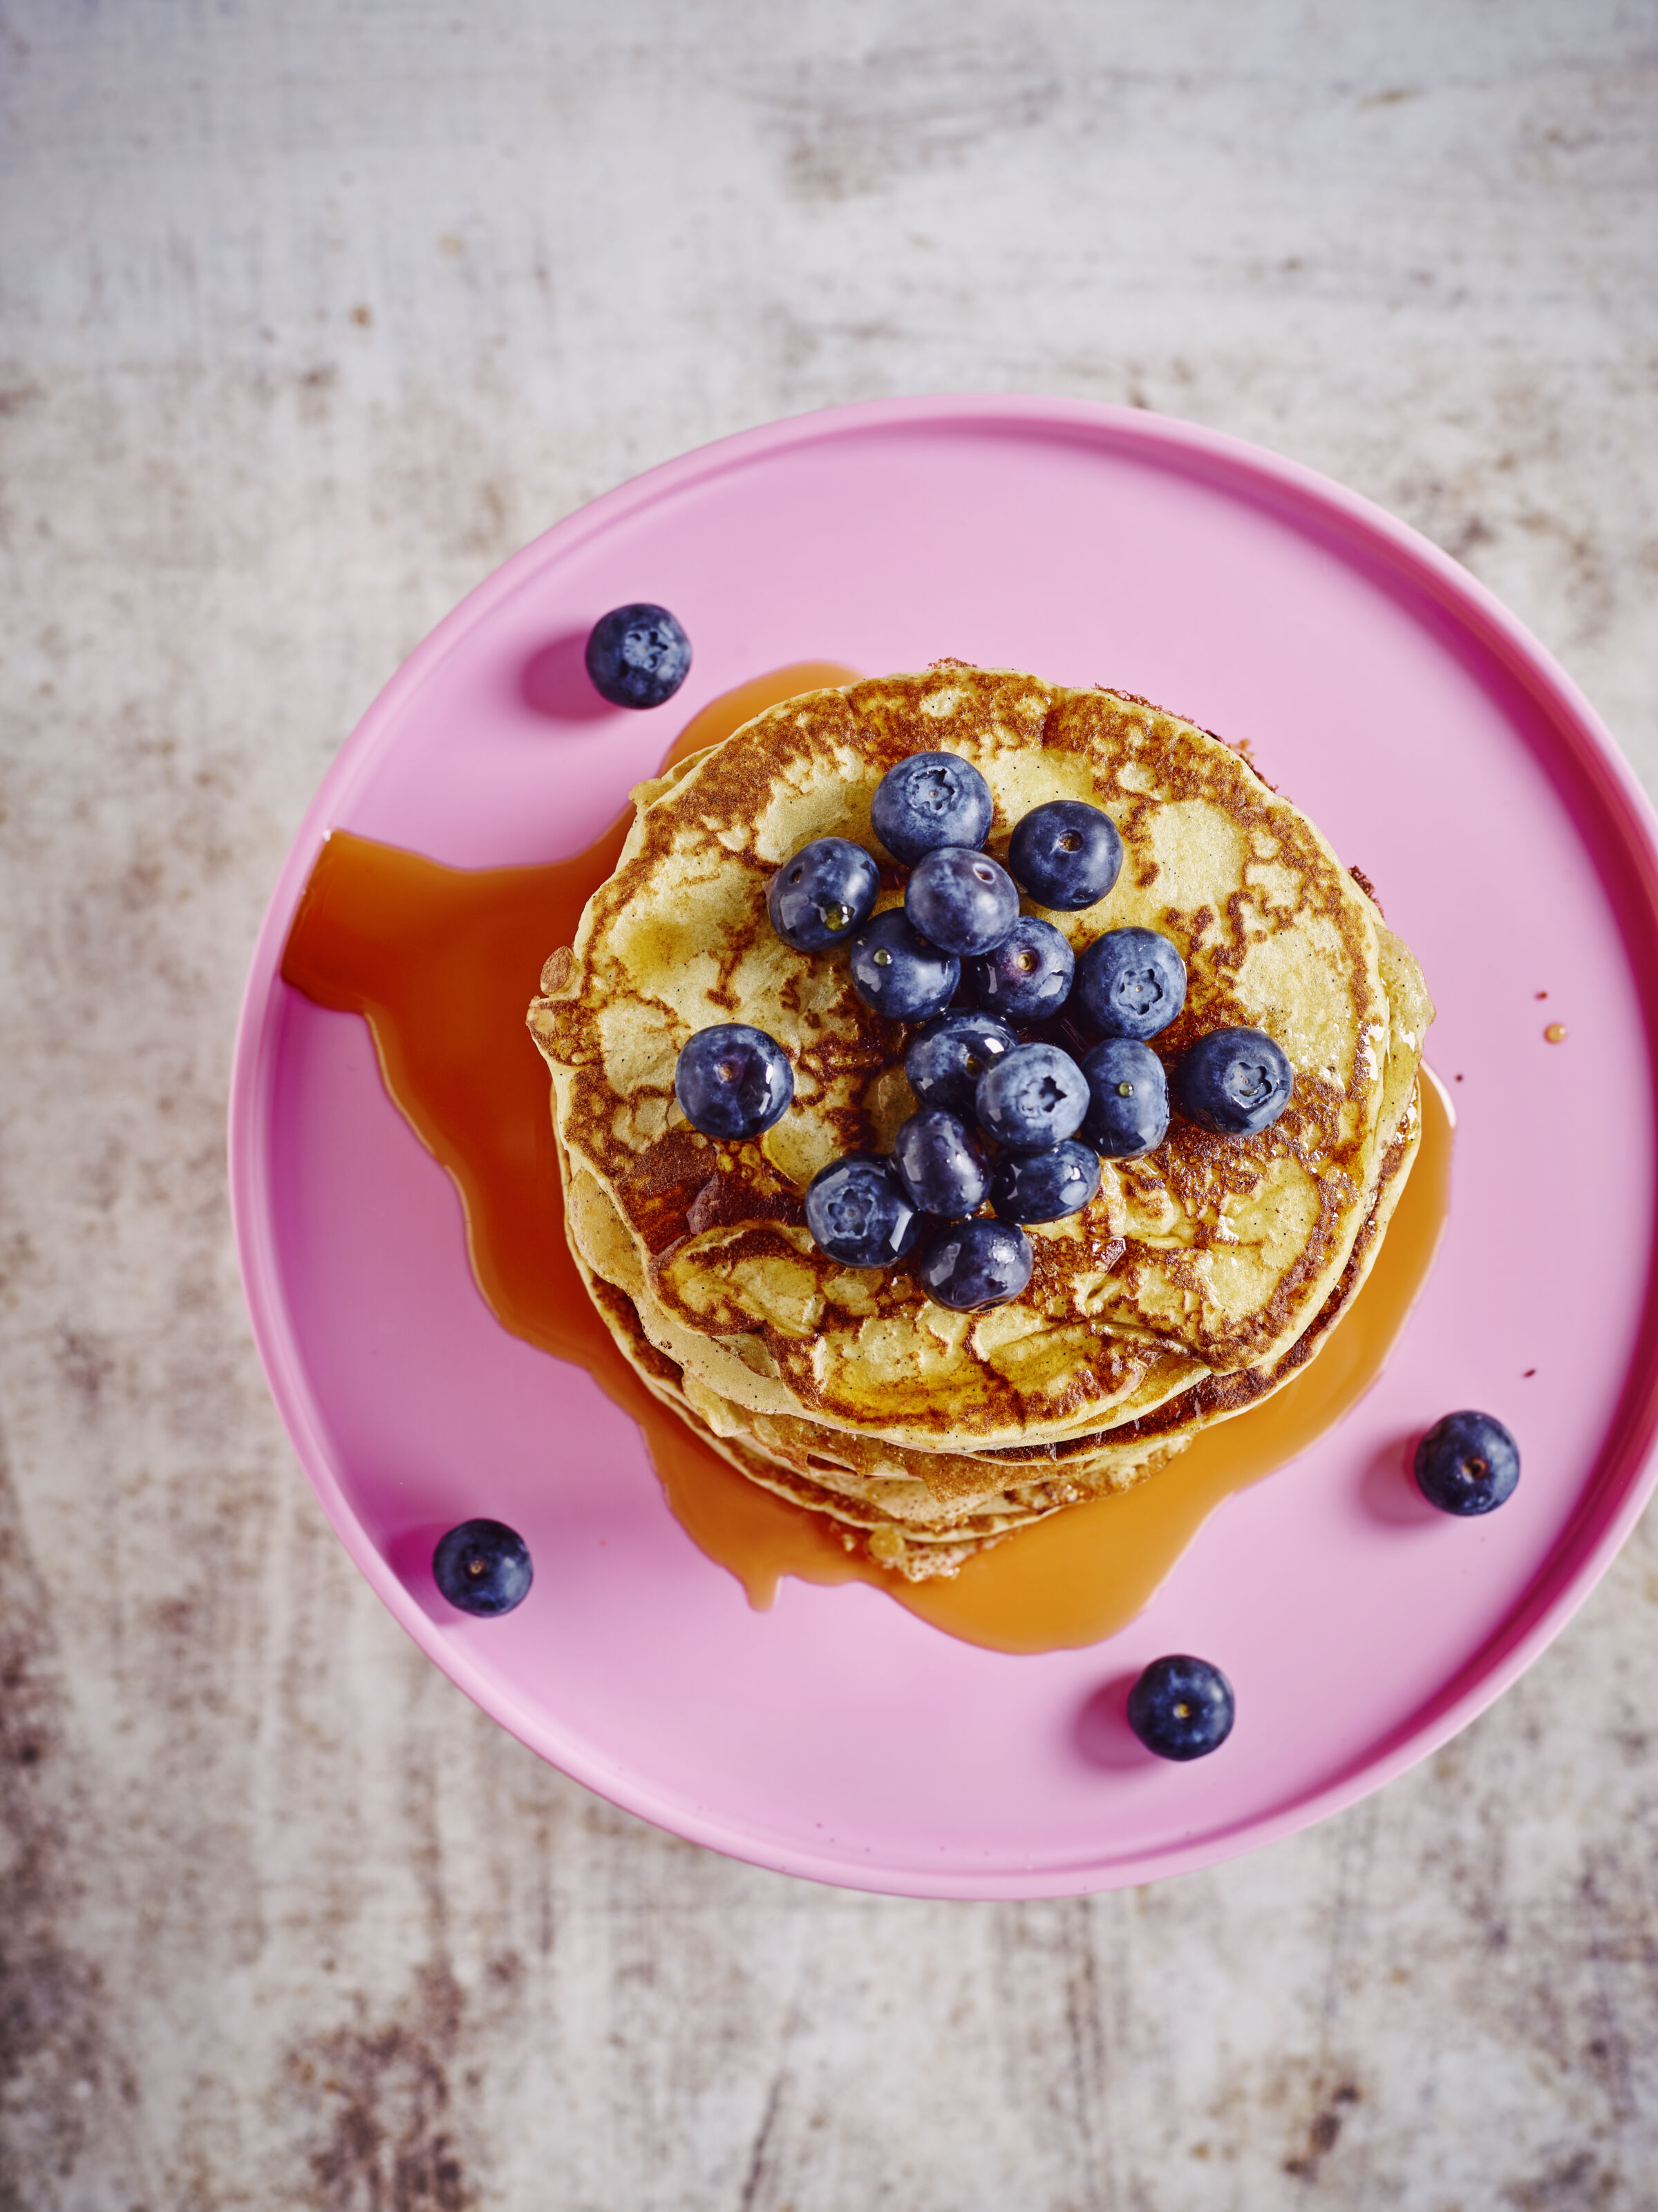 SOFIE DUMONT 22-01 american pancakes 144699